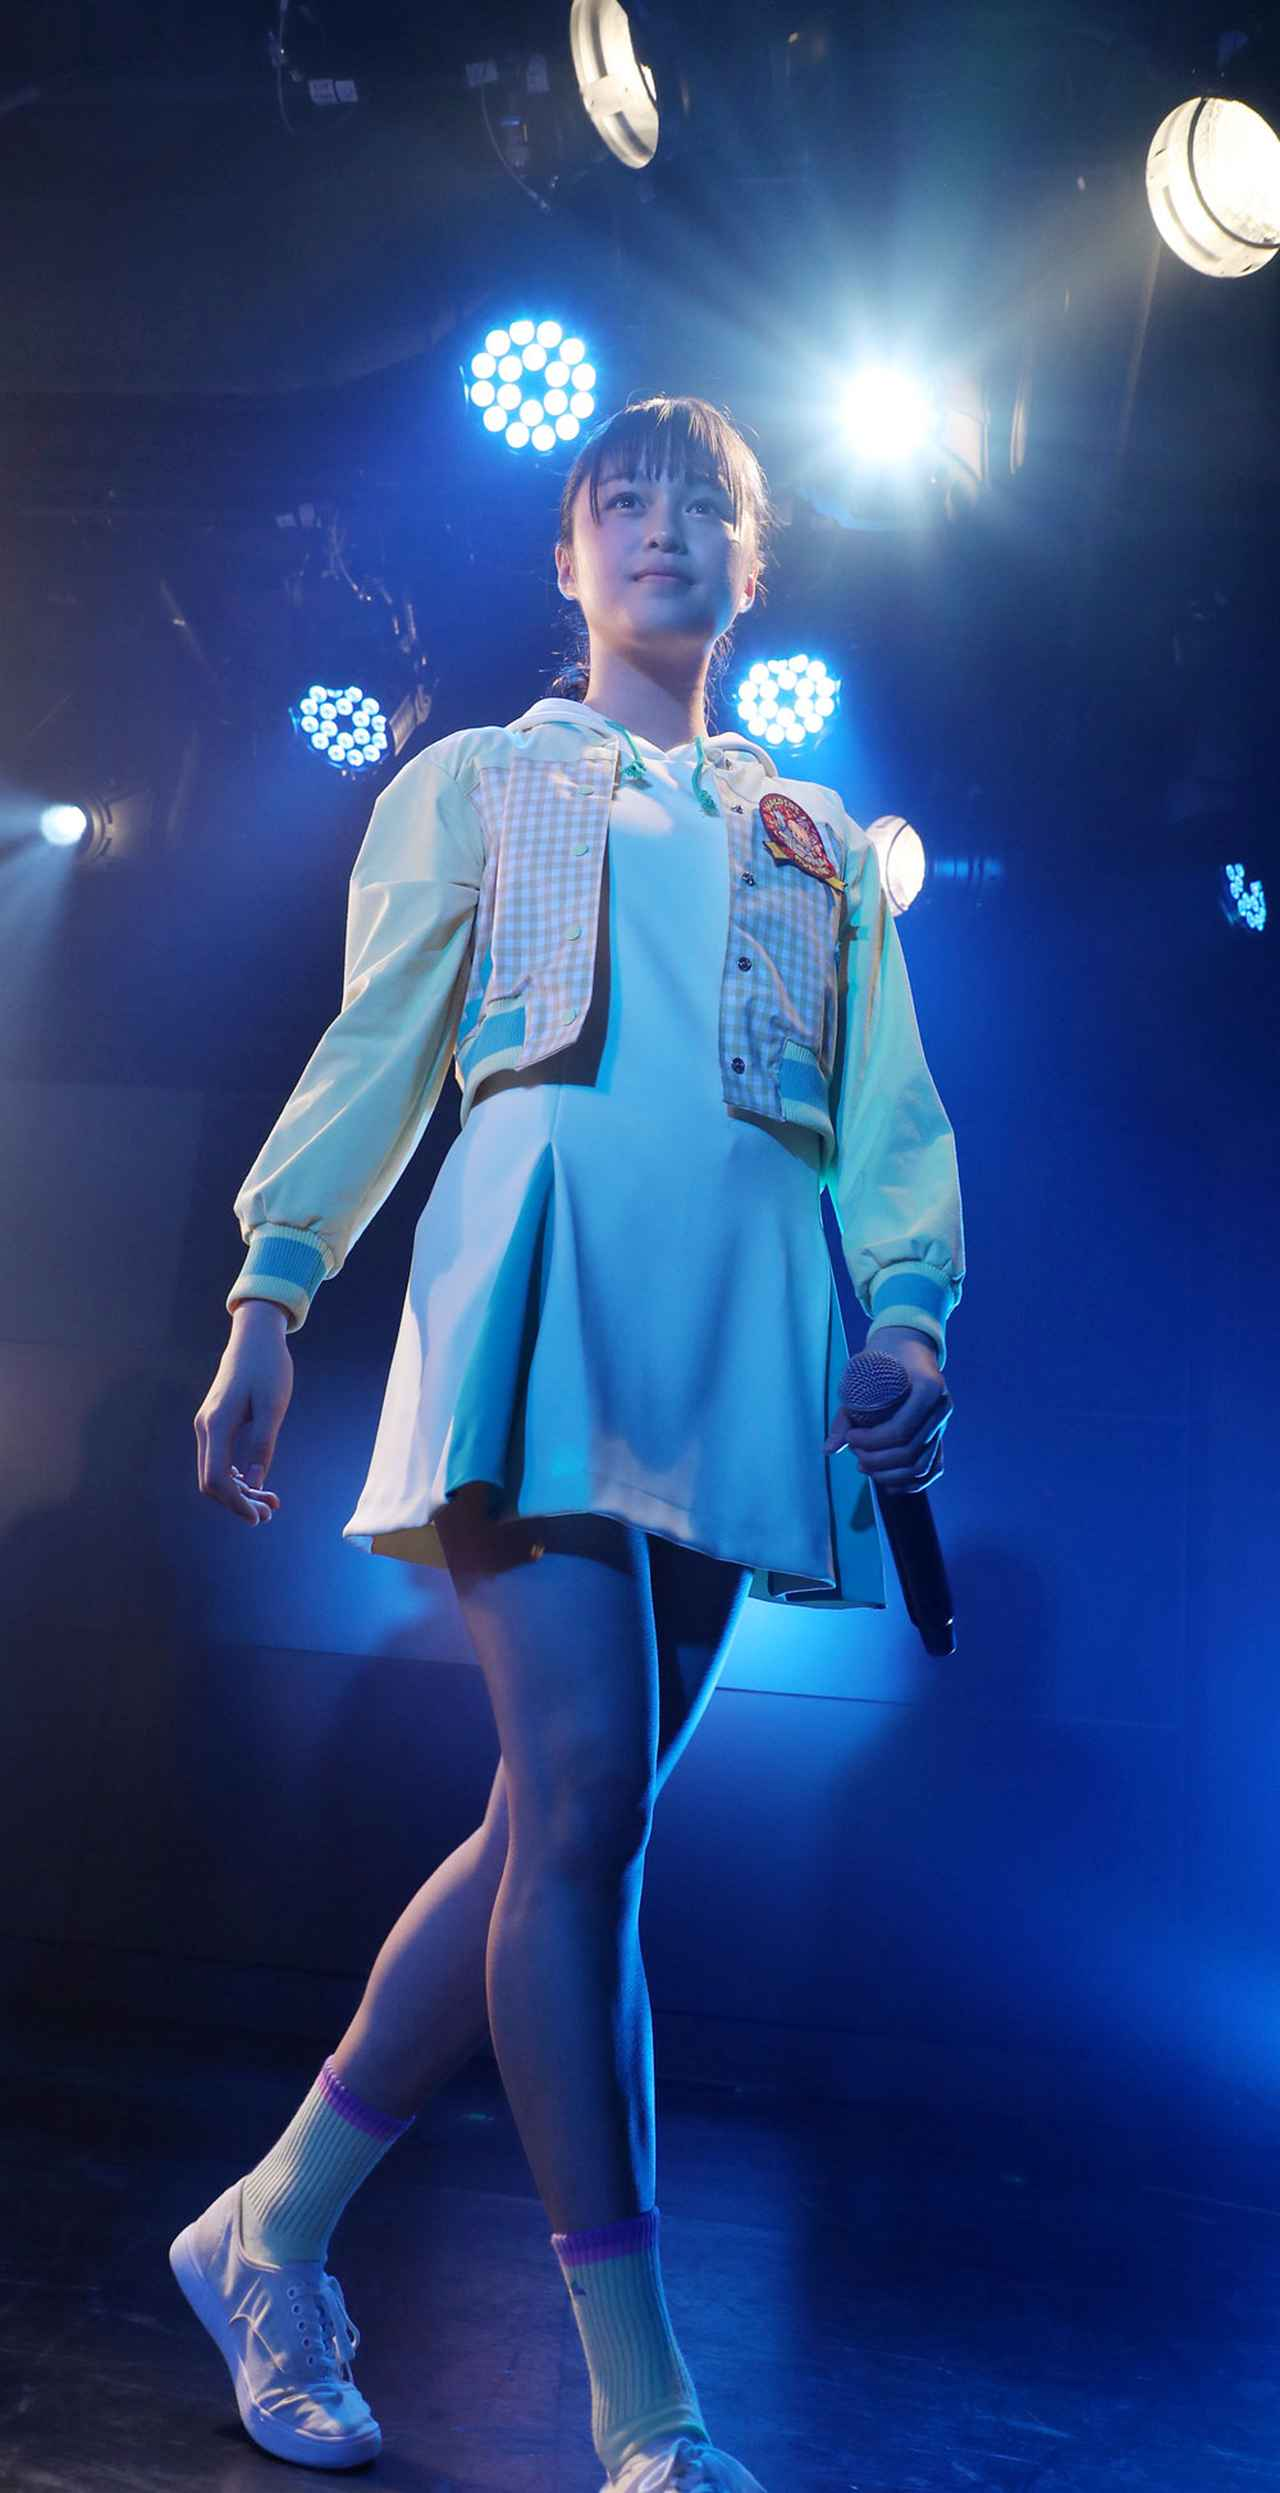 Images : 40番目の画像 - 「ハコイリムスメ/依田彩花、山本花奈を新メンバーに迎え、第5期発足。ロックンロール調の新オリジナル曲「キス取りゲーム」も披露」のアルバム - Stereo Sound ONLINE